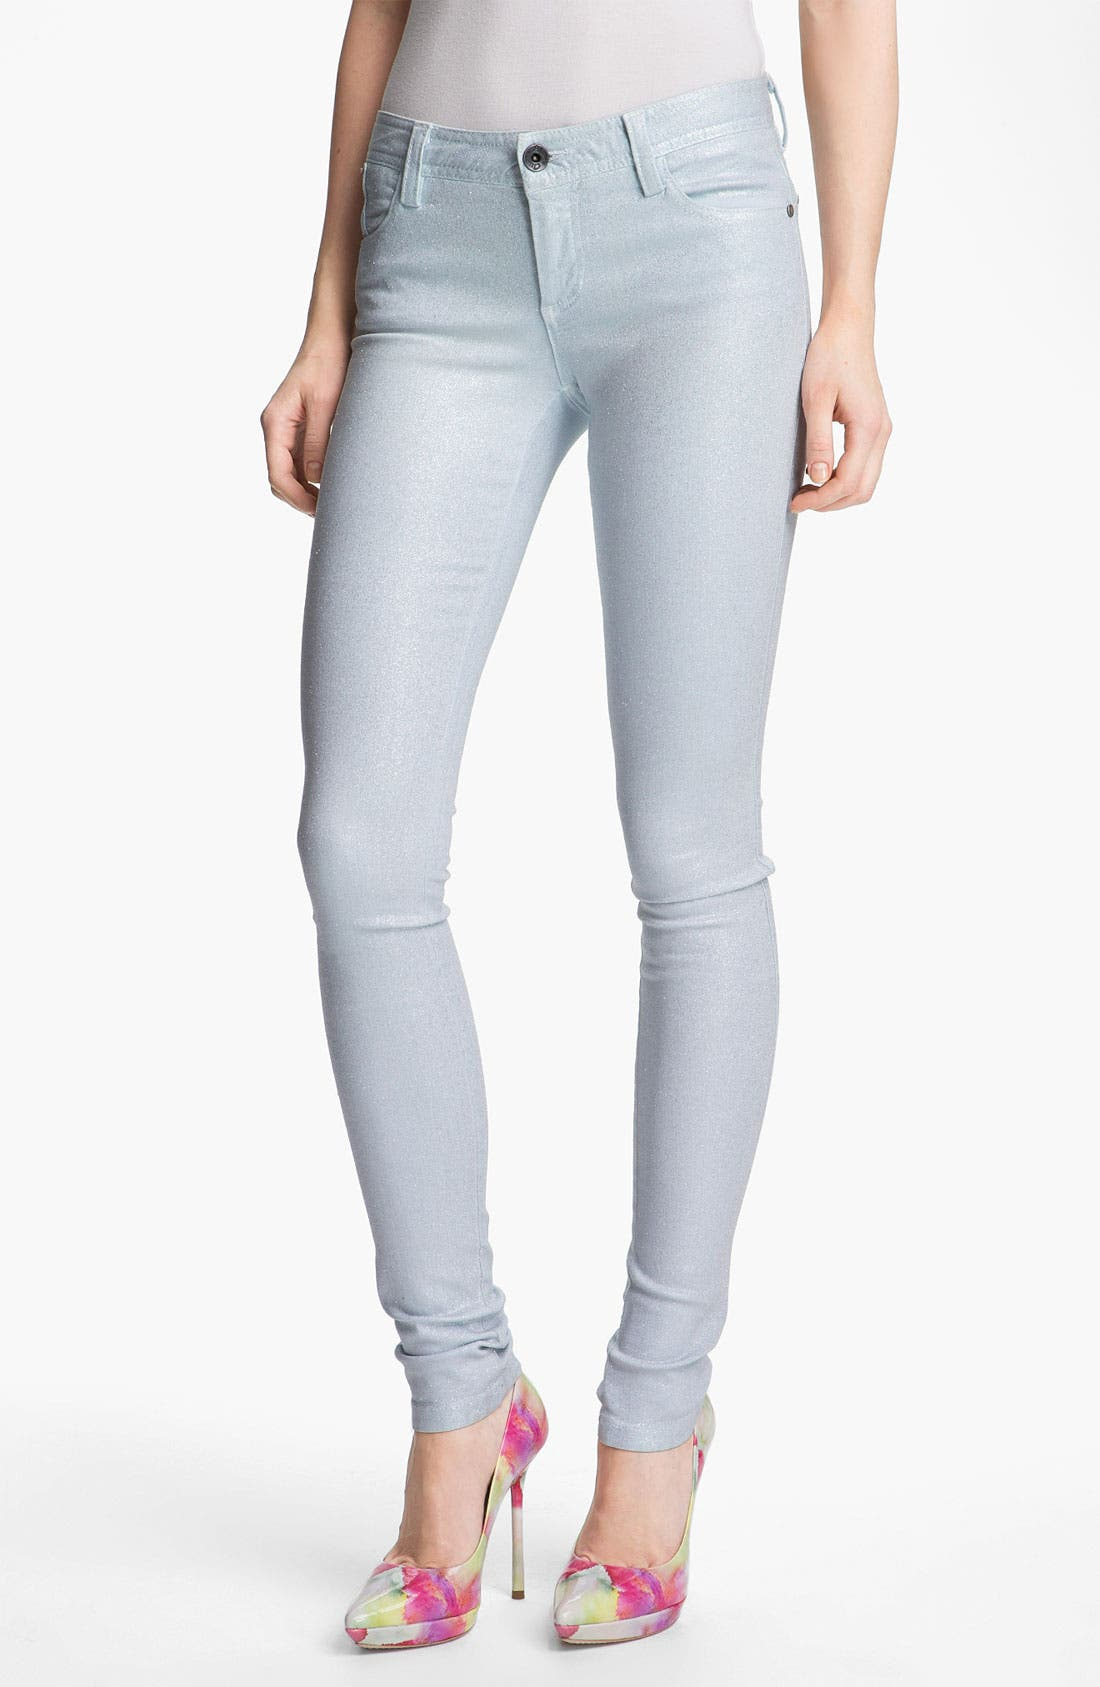 Alternate Image 1 Selected - Alice + Olivia Glitter Skinny Stretch Jeans